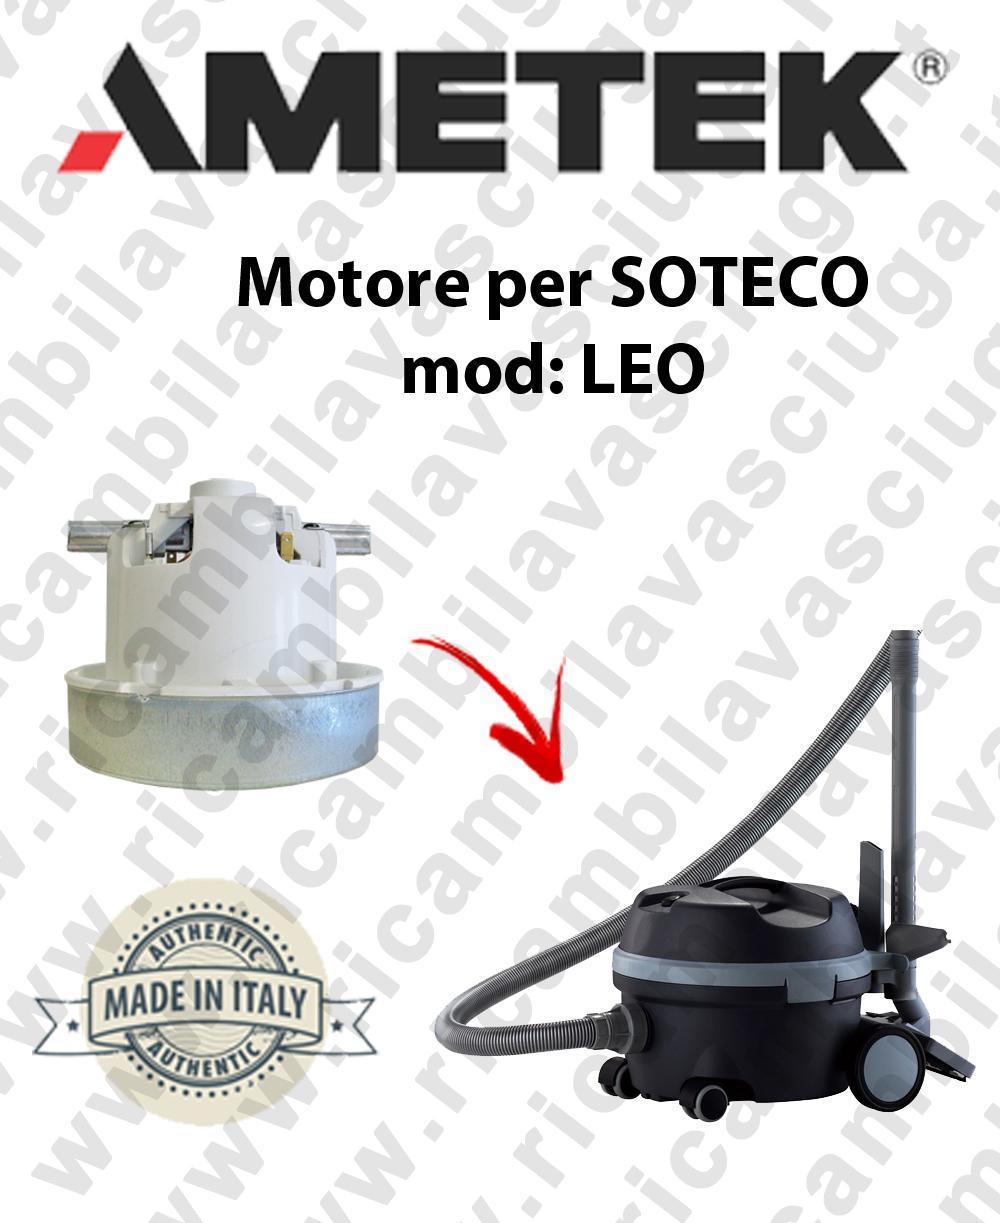 LEO Motore de aspiración AMETEK  para aspiradora SOTECO